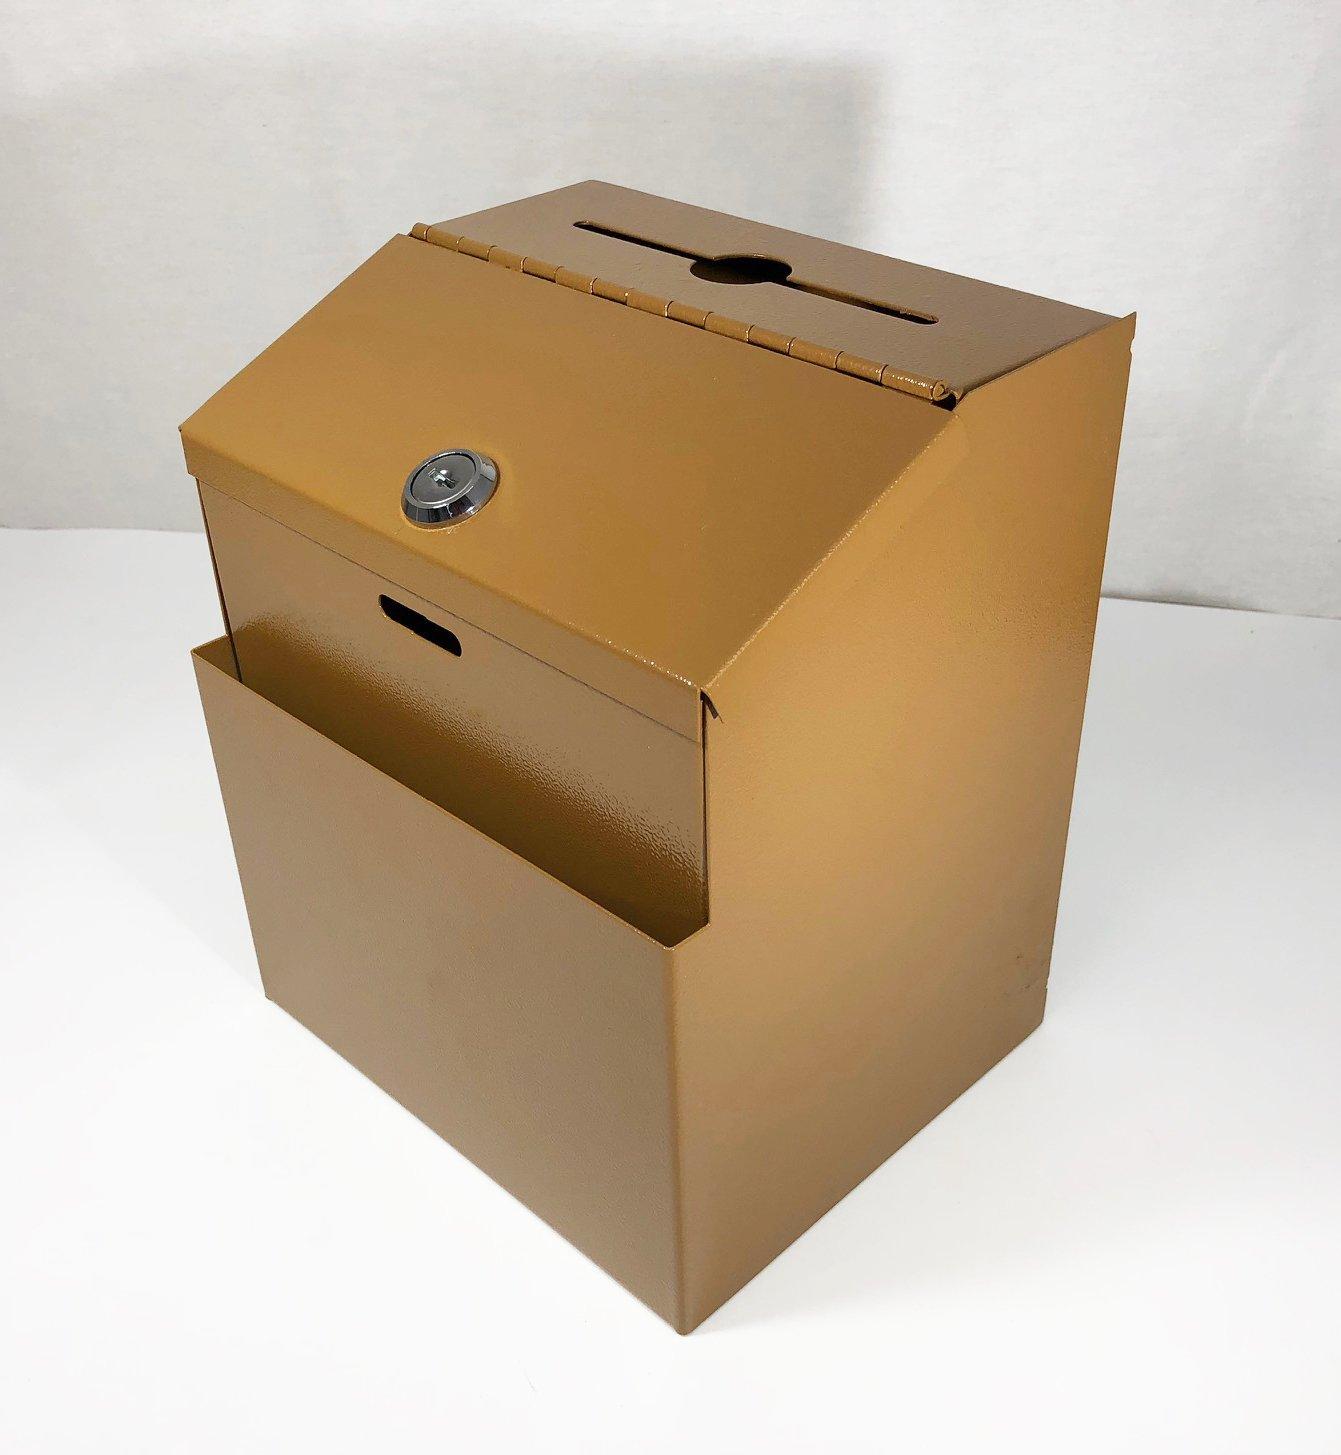 FixtureDisplays Copper Box, Metal Donation Suggestion Key Drop 7'' x 8.4'' x 5.5'' Express Checkout Comments Sales Lead box11118-COPPER